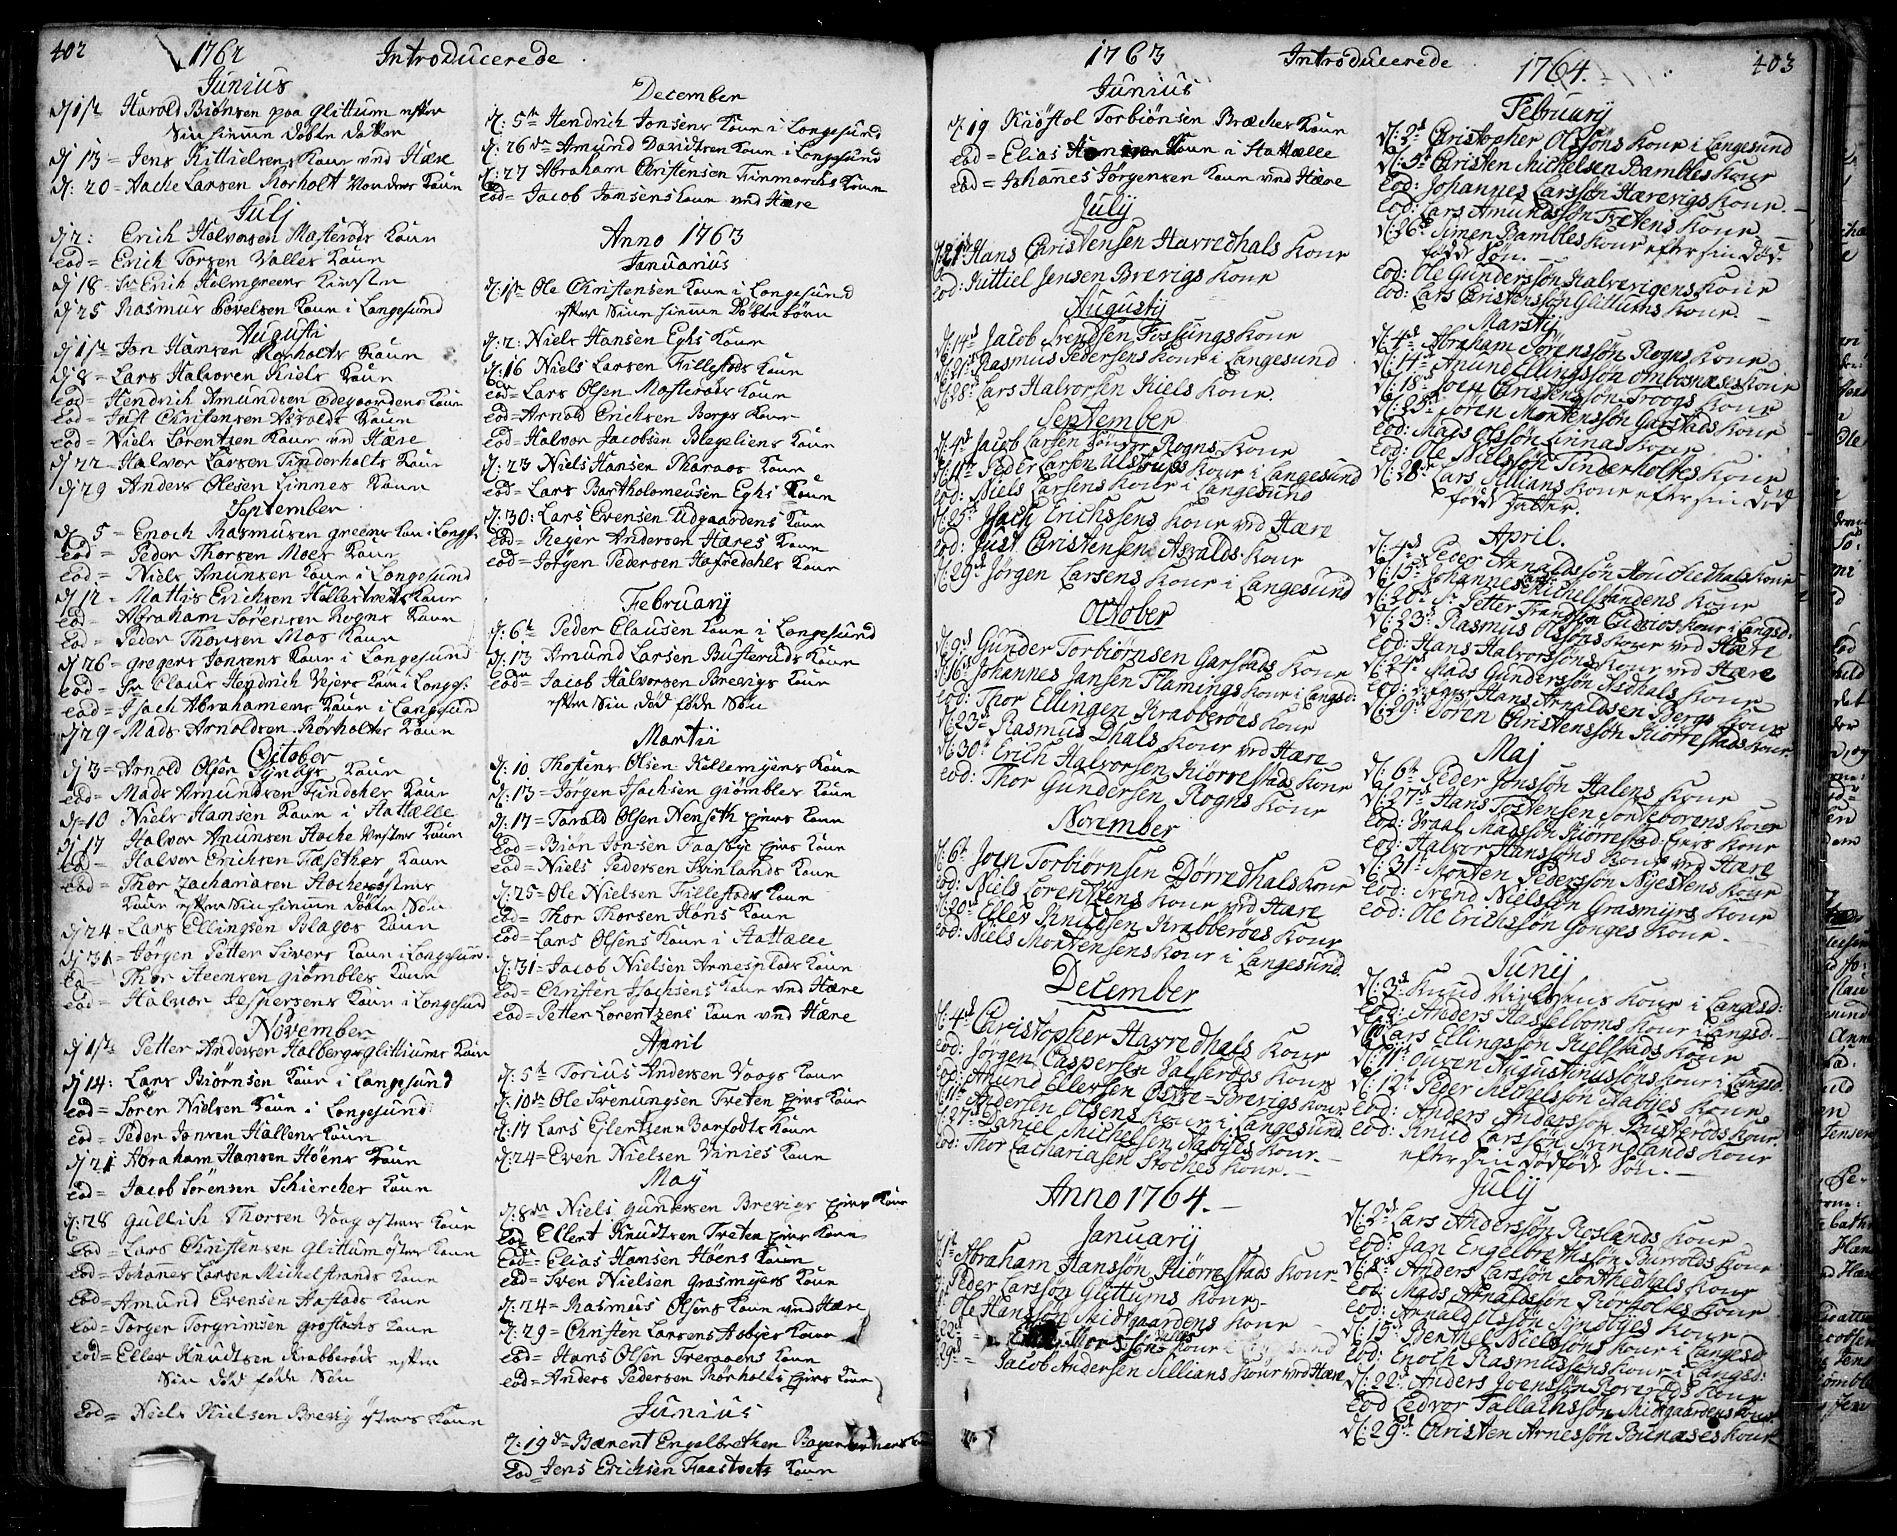 SAKO, Bamble kirkebøker, F/Fa/L0001: Ministerialbok nr. I 1, 1702-1774, s. 402-403